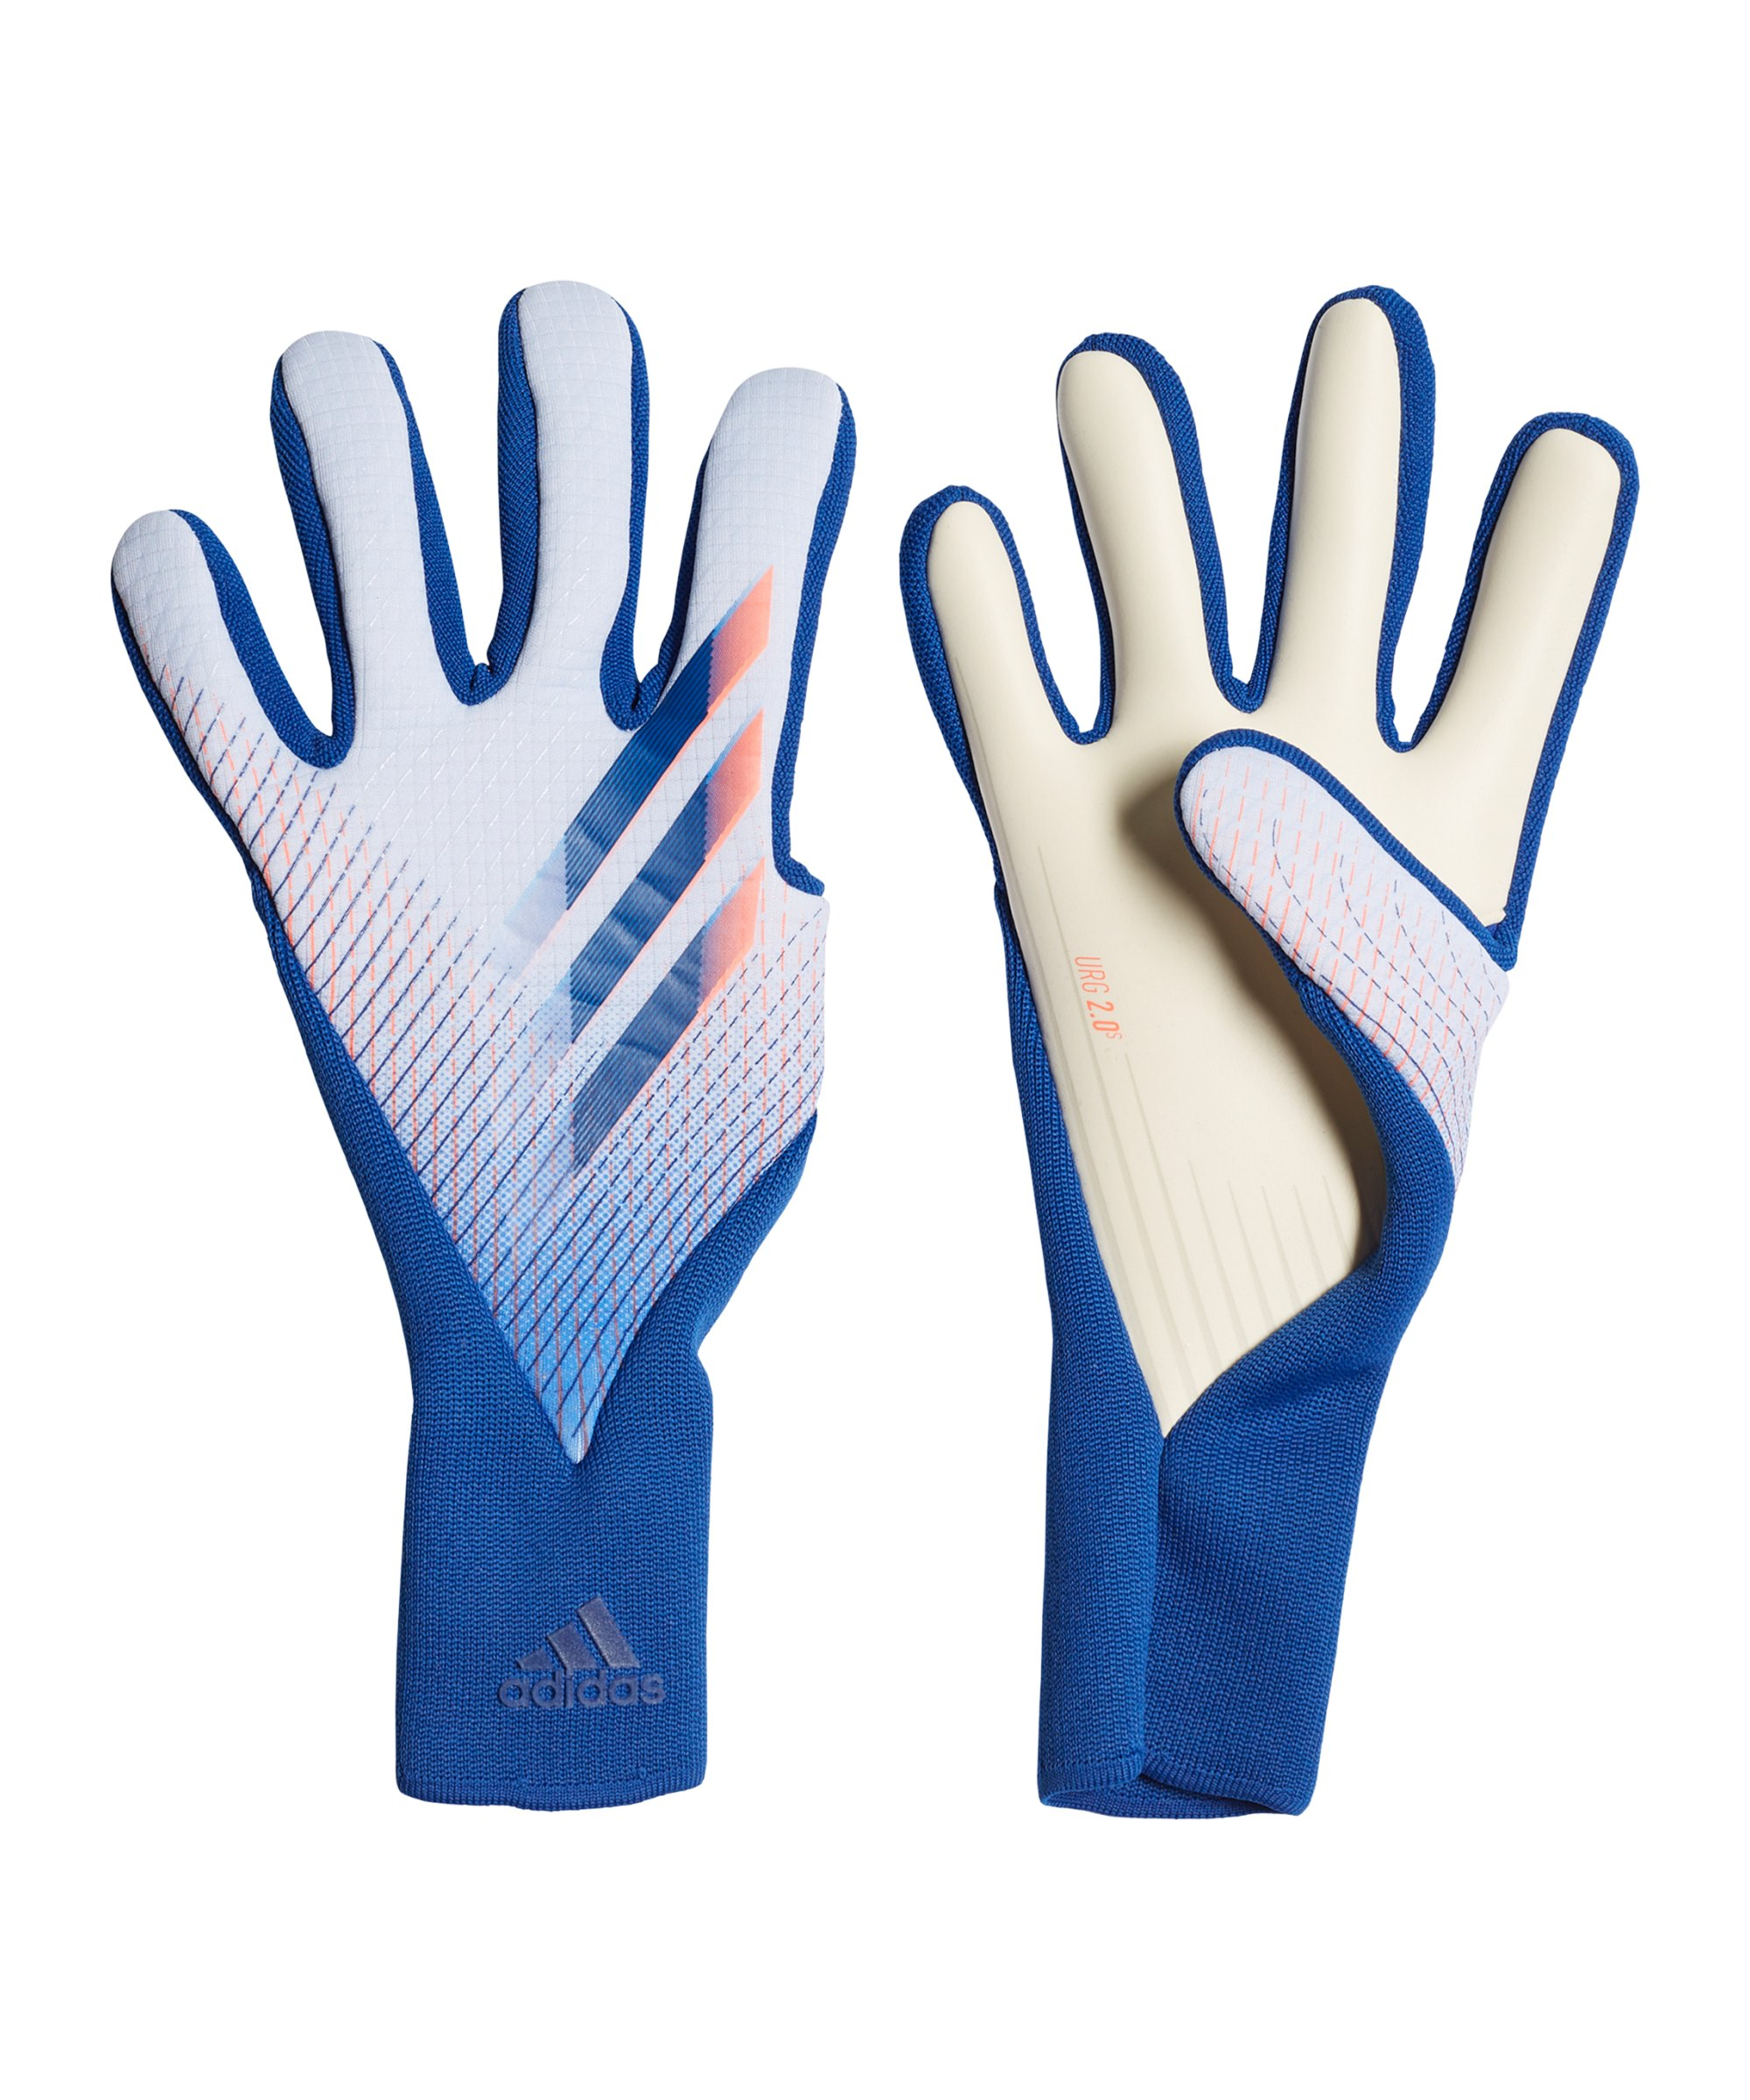 adidas X Glory Hunter Pro Torwarthandschuhe Blau - blau